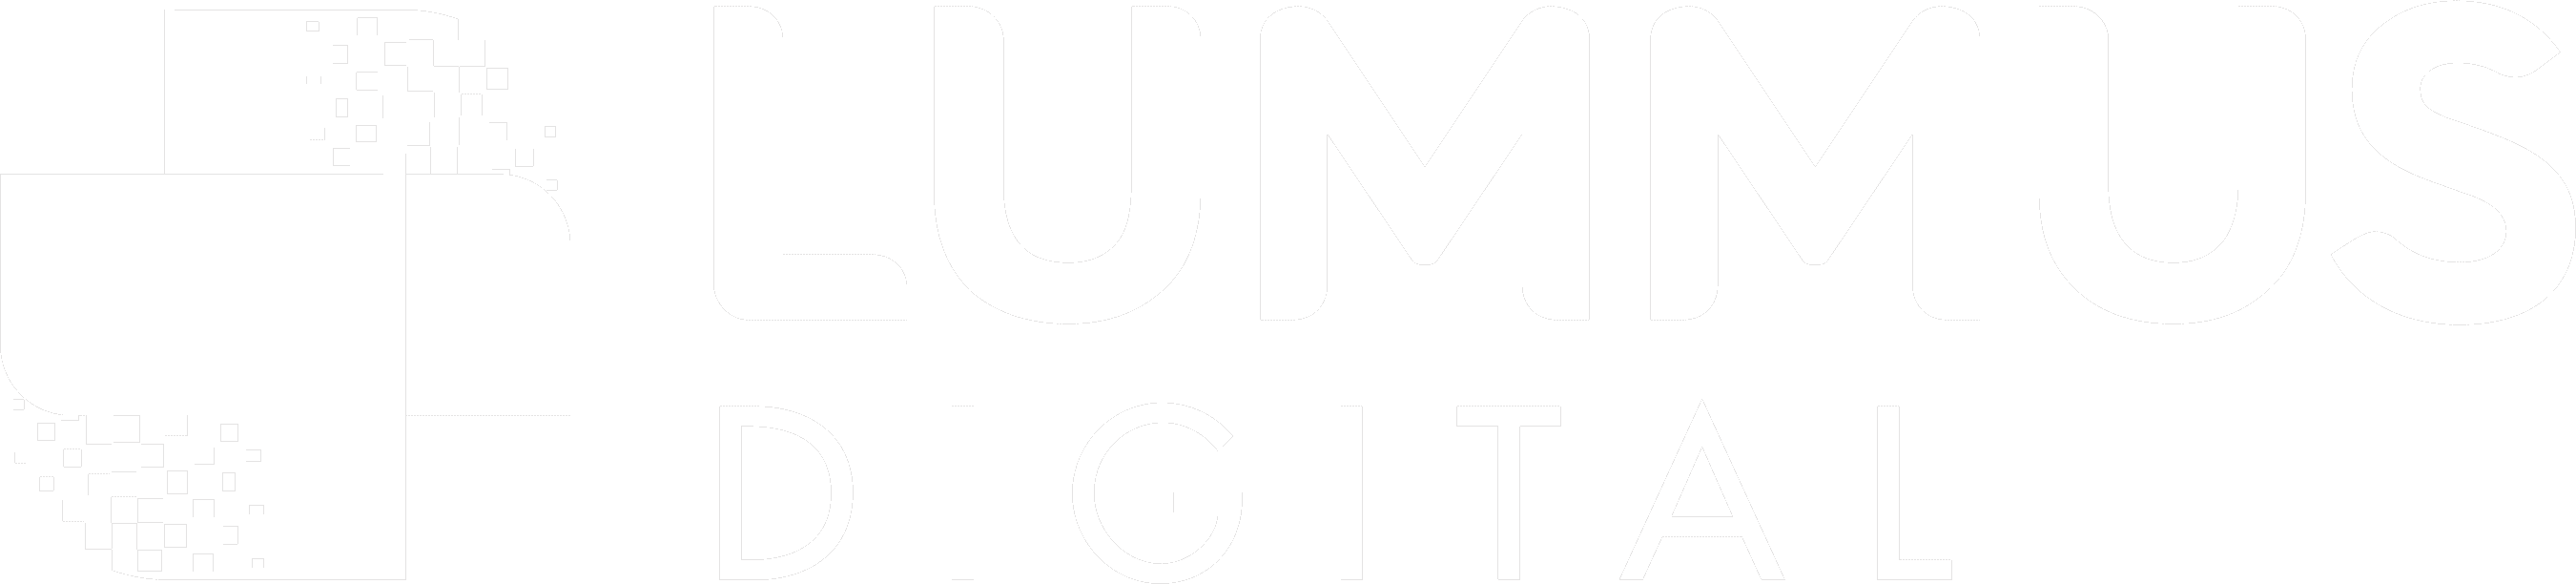 Lummus Digital